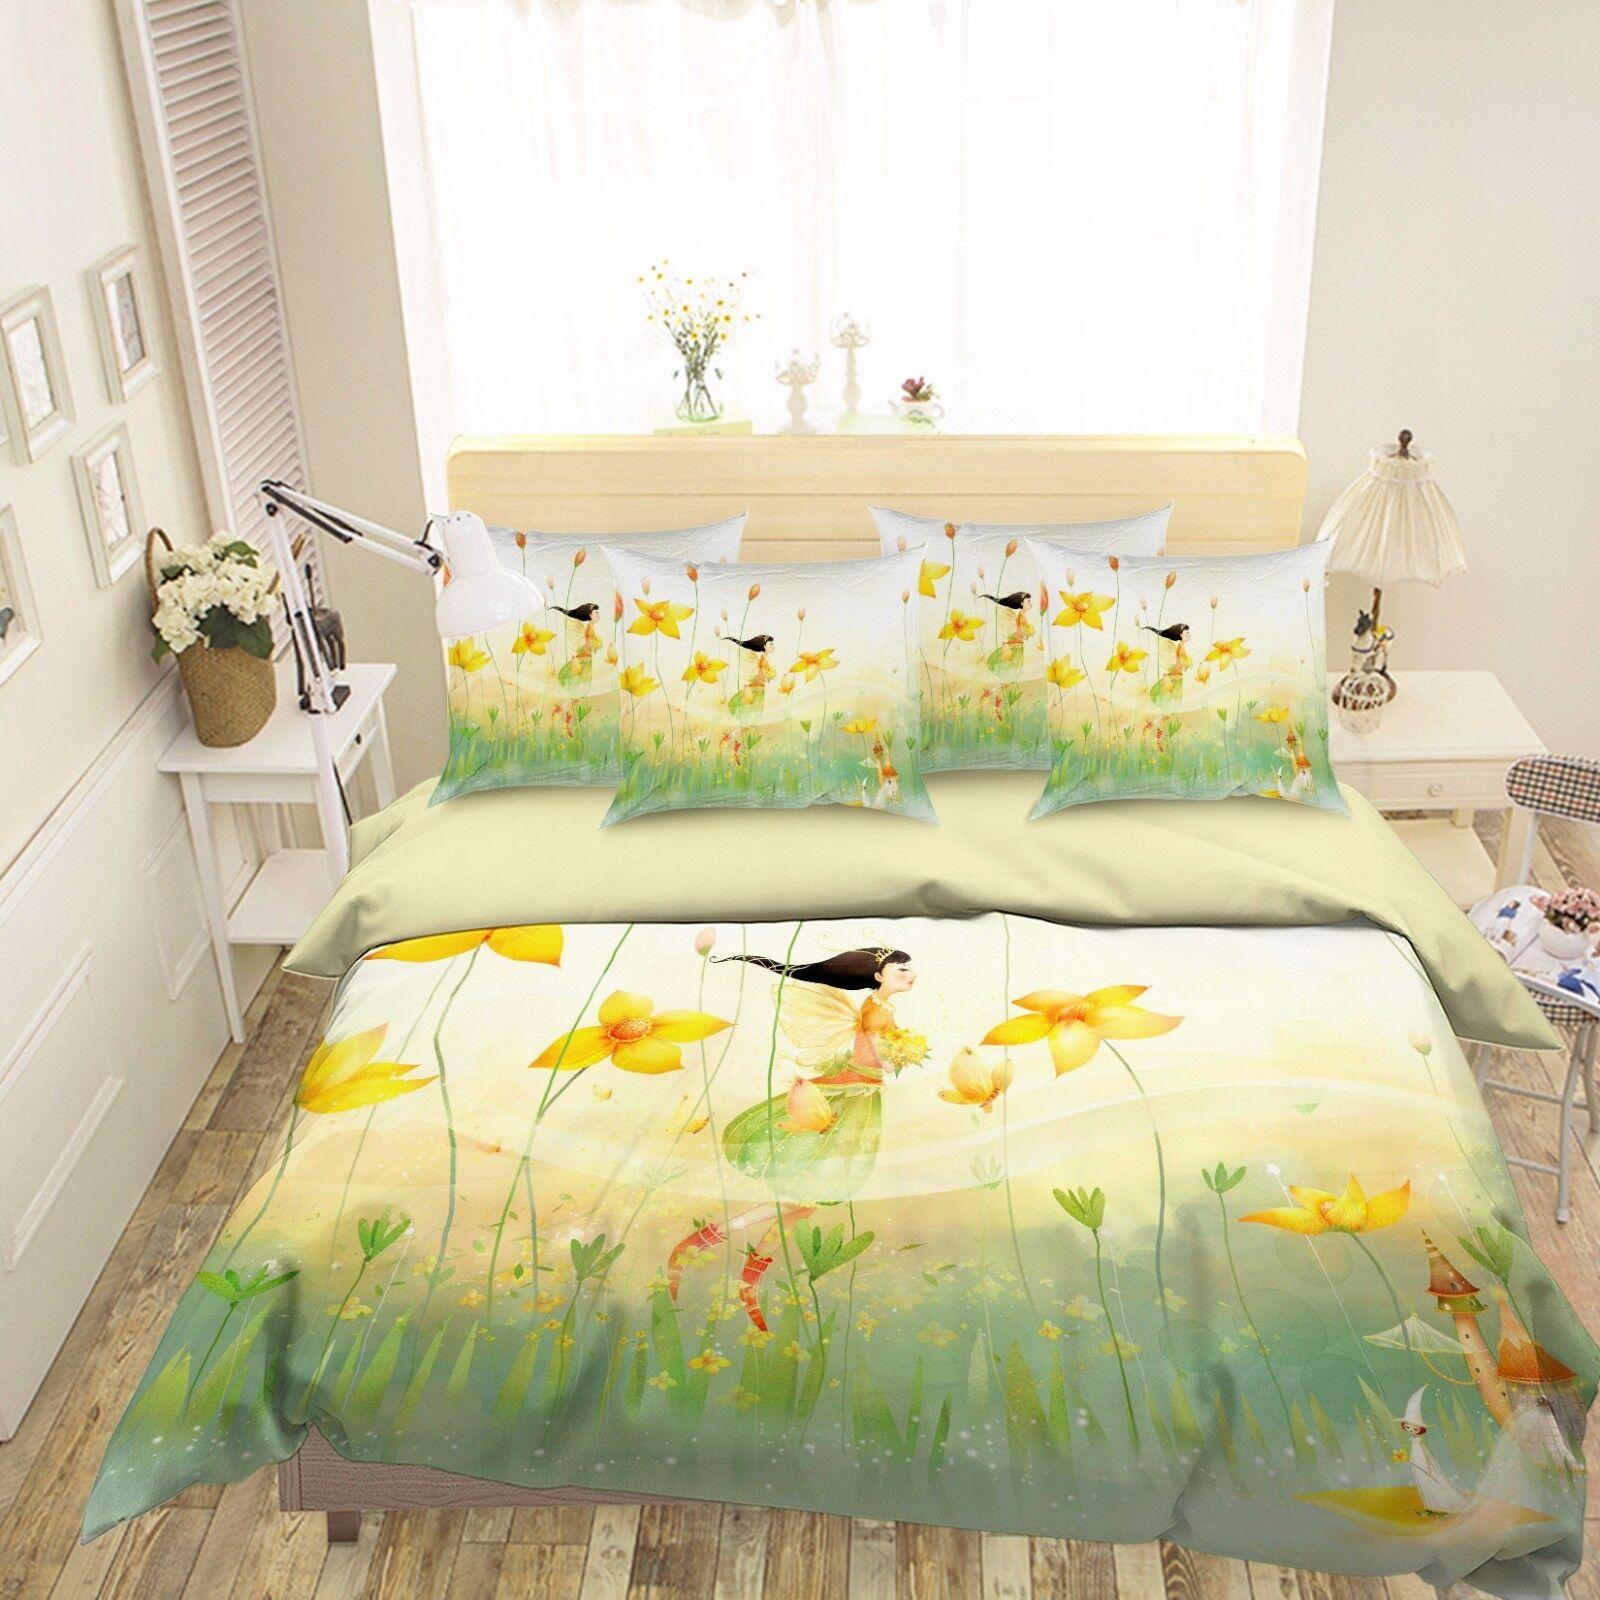 3D Flower Elf 23 Bett Pillowcases Quilt Duvet Startseite Set Single Königin König Größe AU